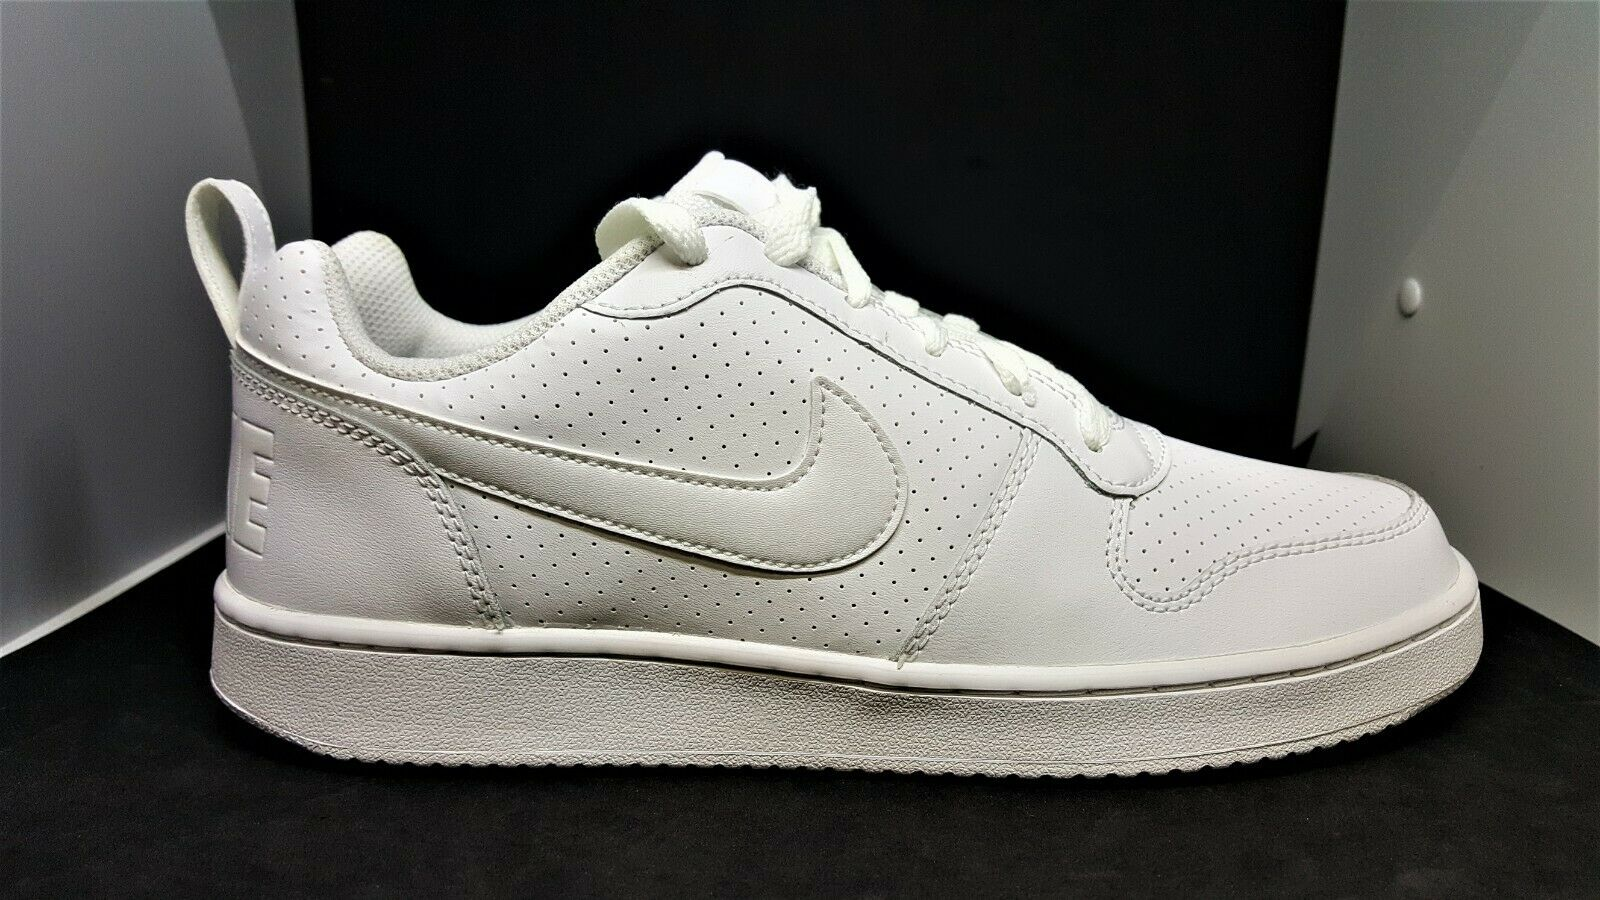 Nike Court Bgoldugh Low Men's Sneakers Sports shoes shoes shoes 838937-111 cdc518